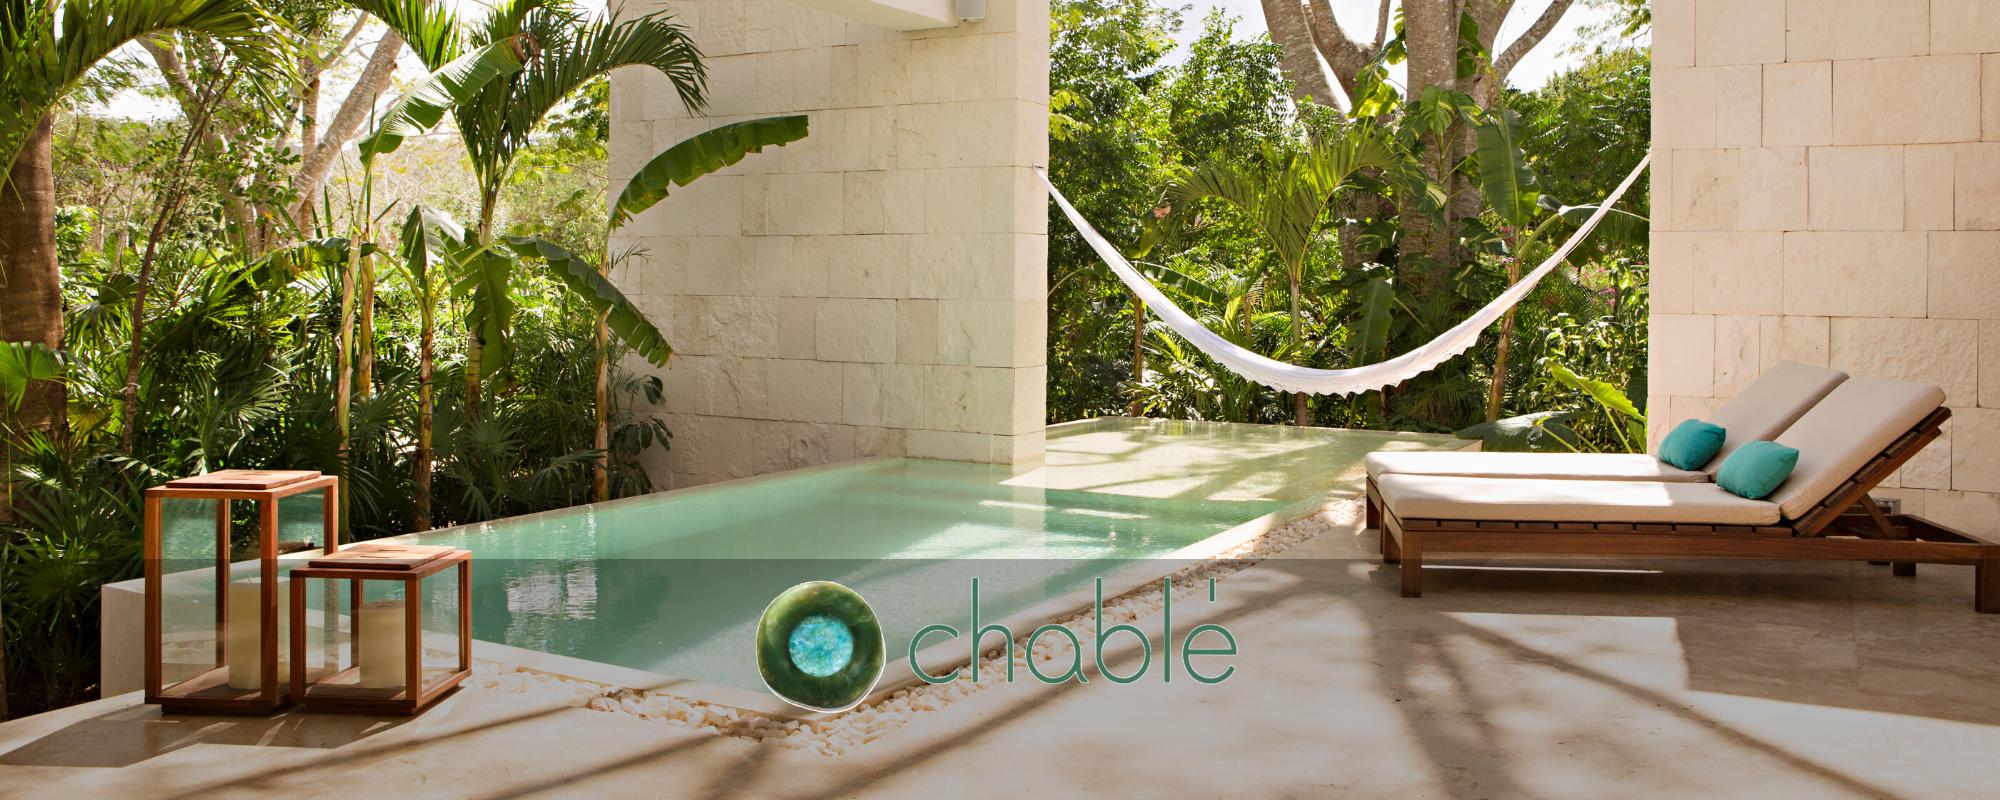 Chable Yucatan homepage slider